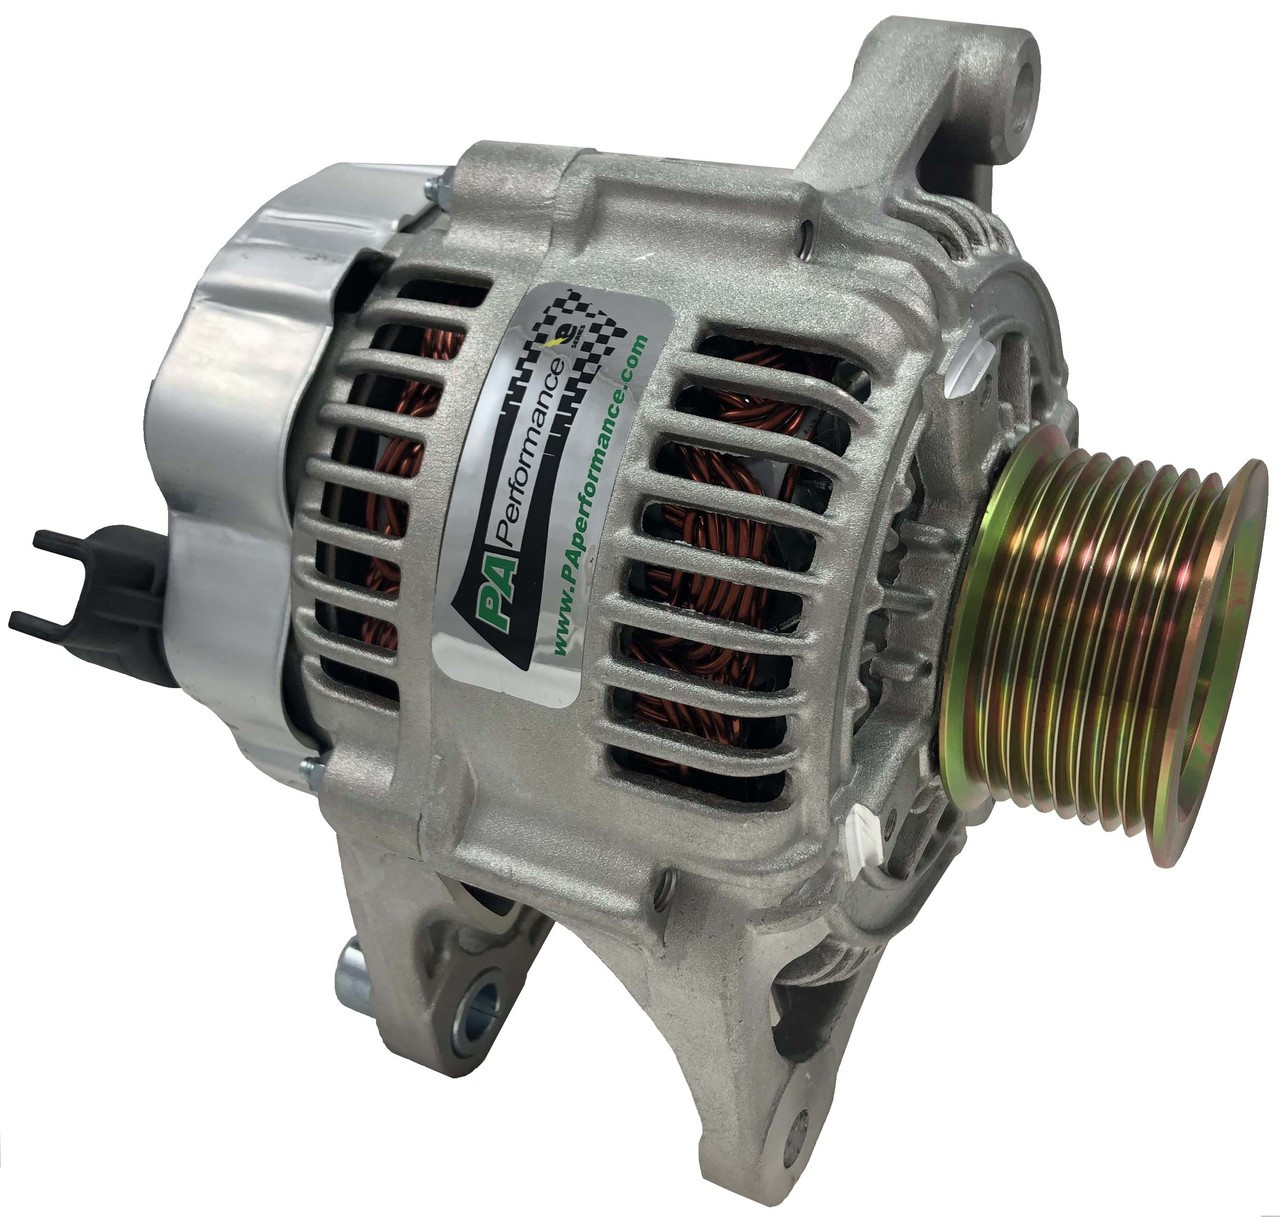 136a Denso Style Alternator 5 9 Cummins 1 Wire 2227se